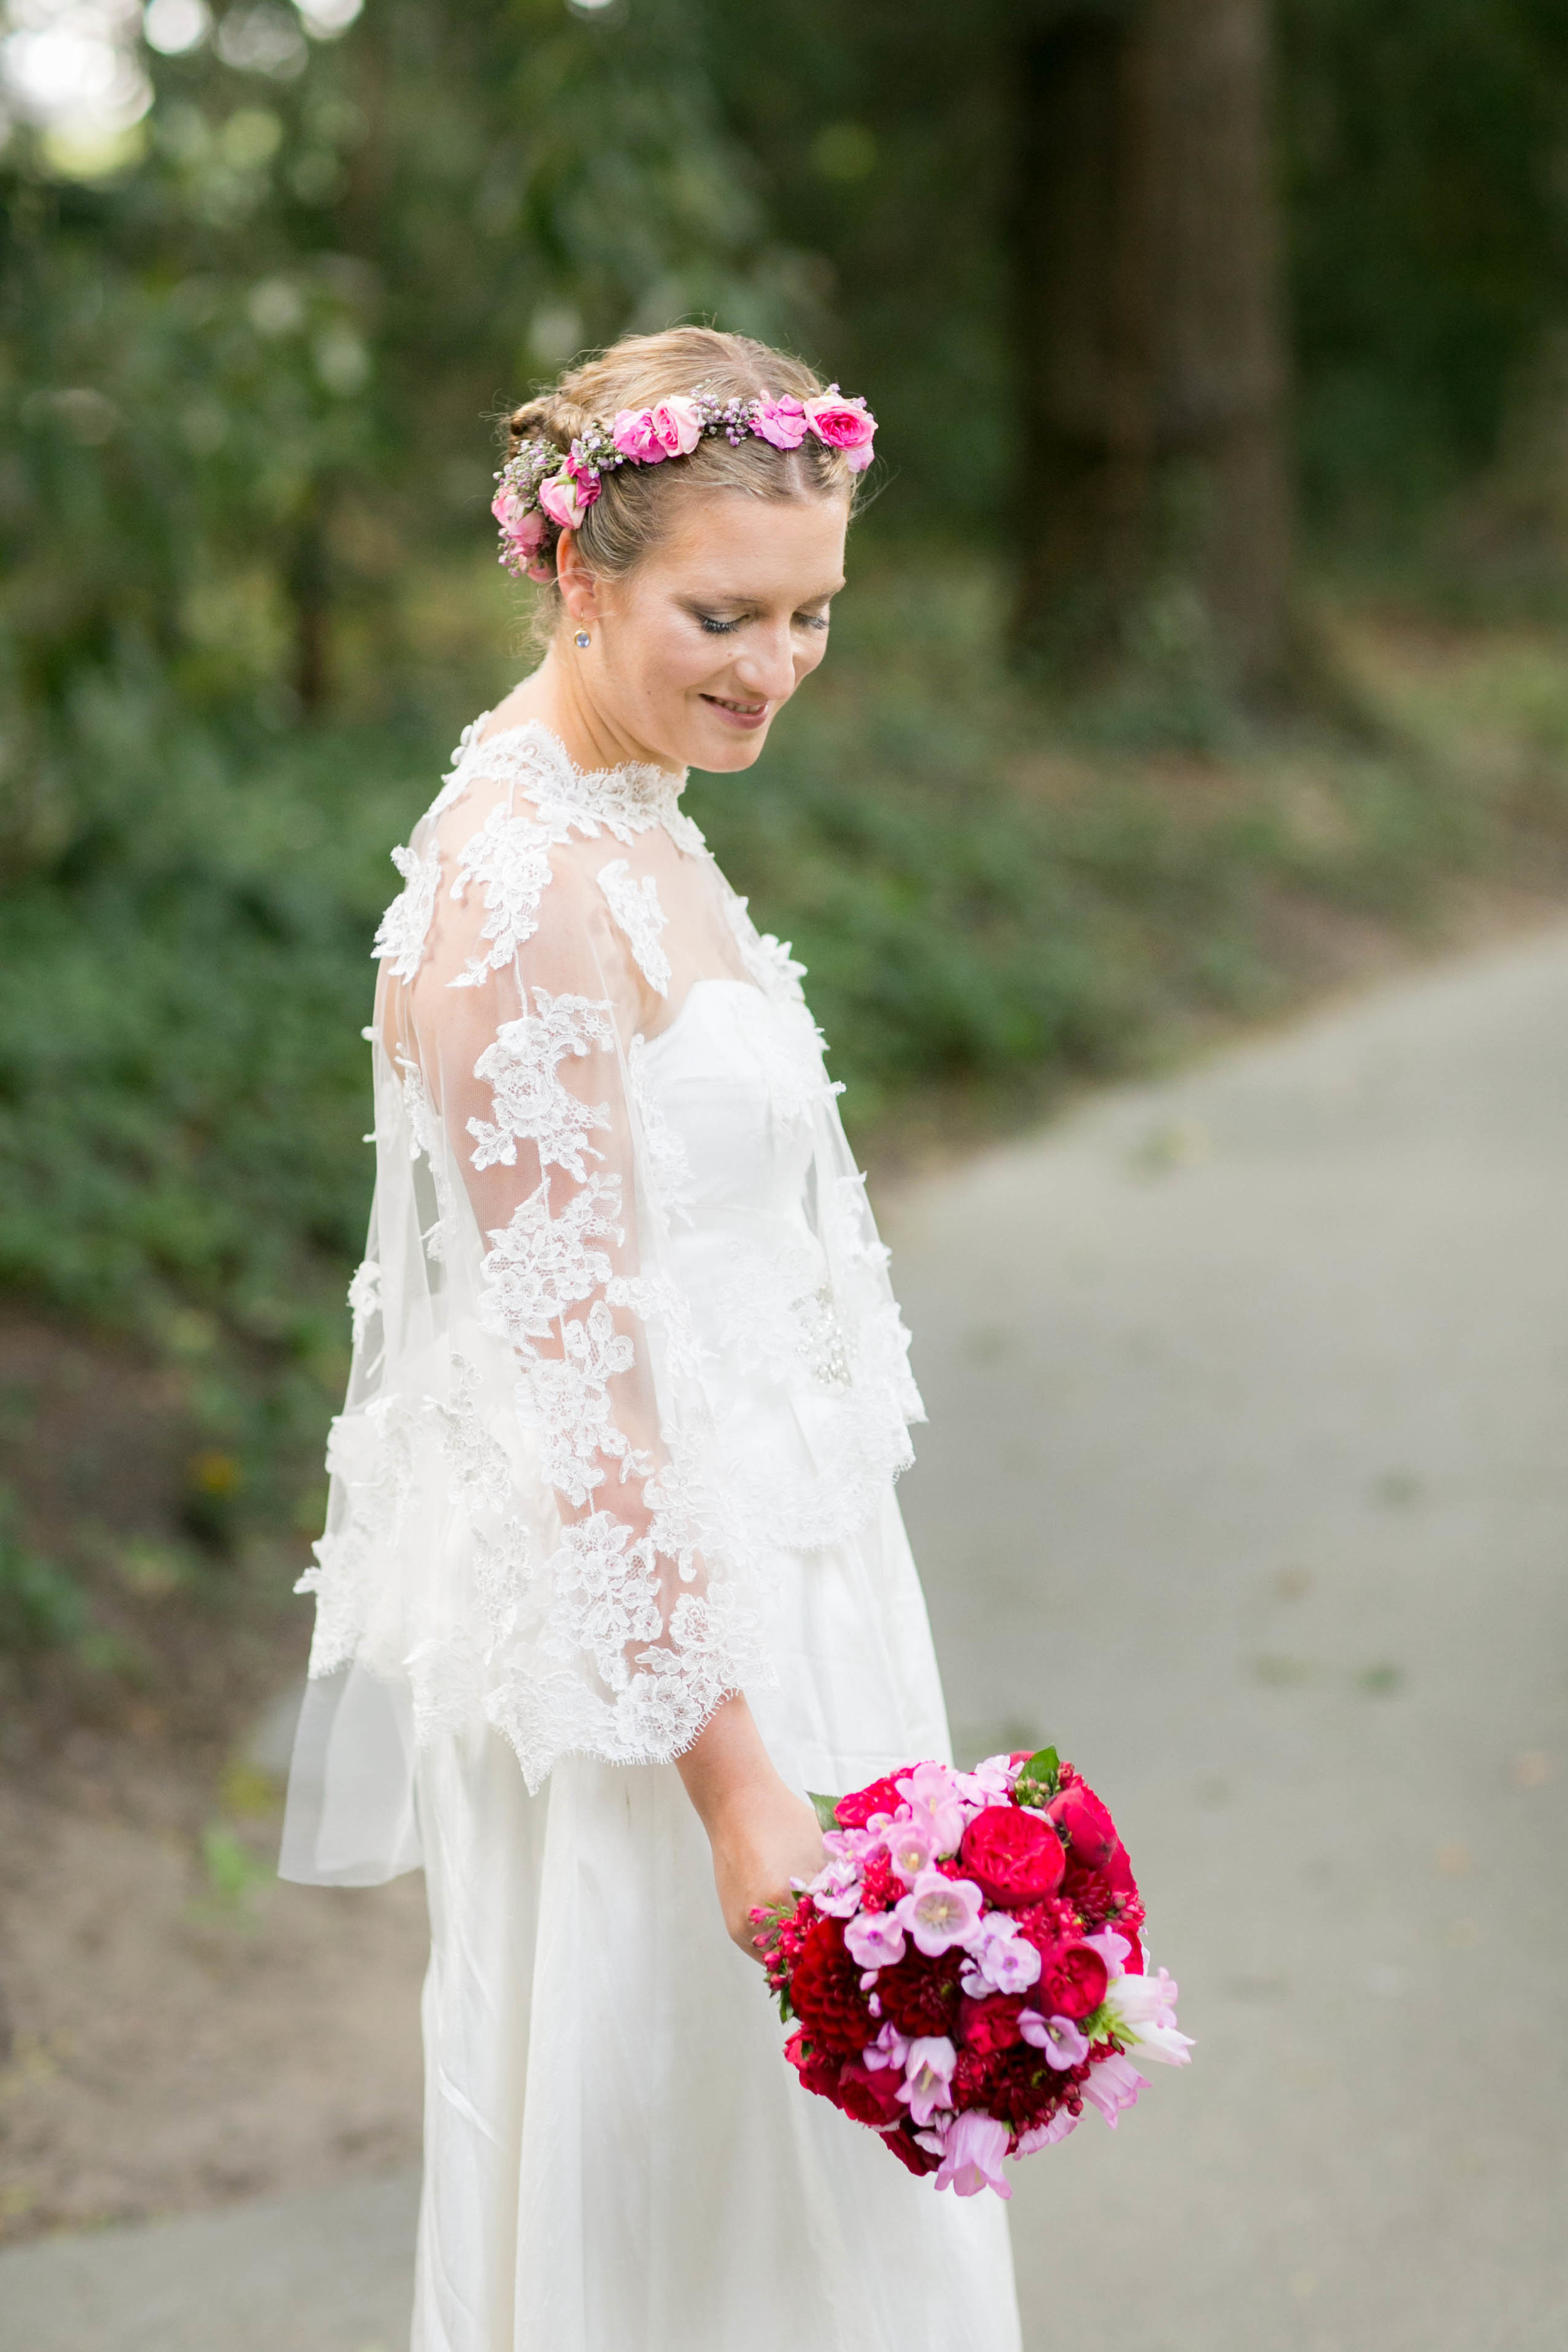 Fran Burrows Berlin Hochzeitsfotografie-51.jpg